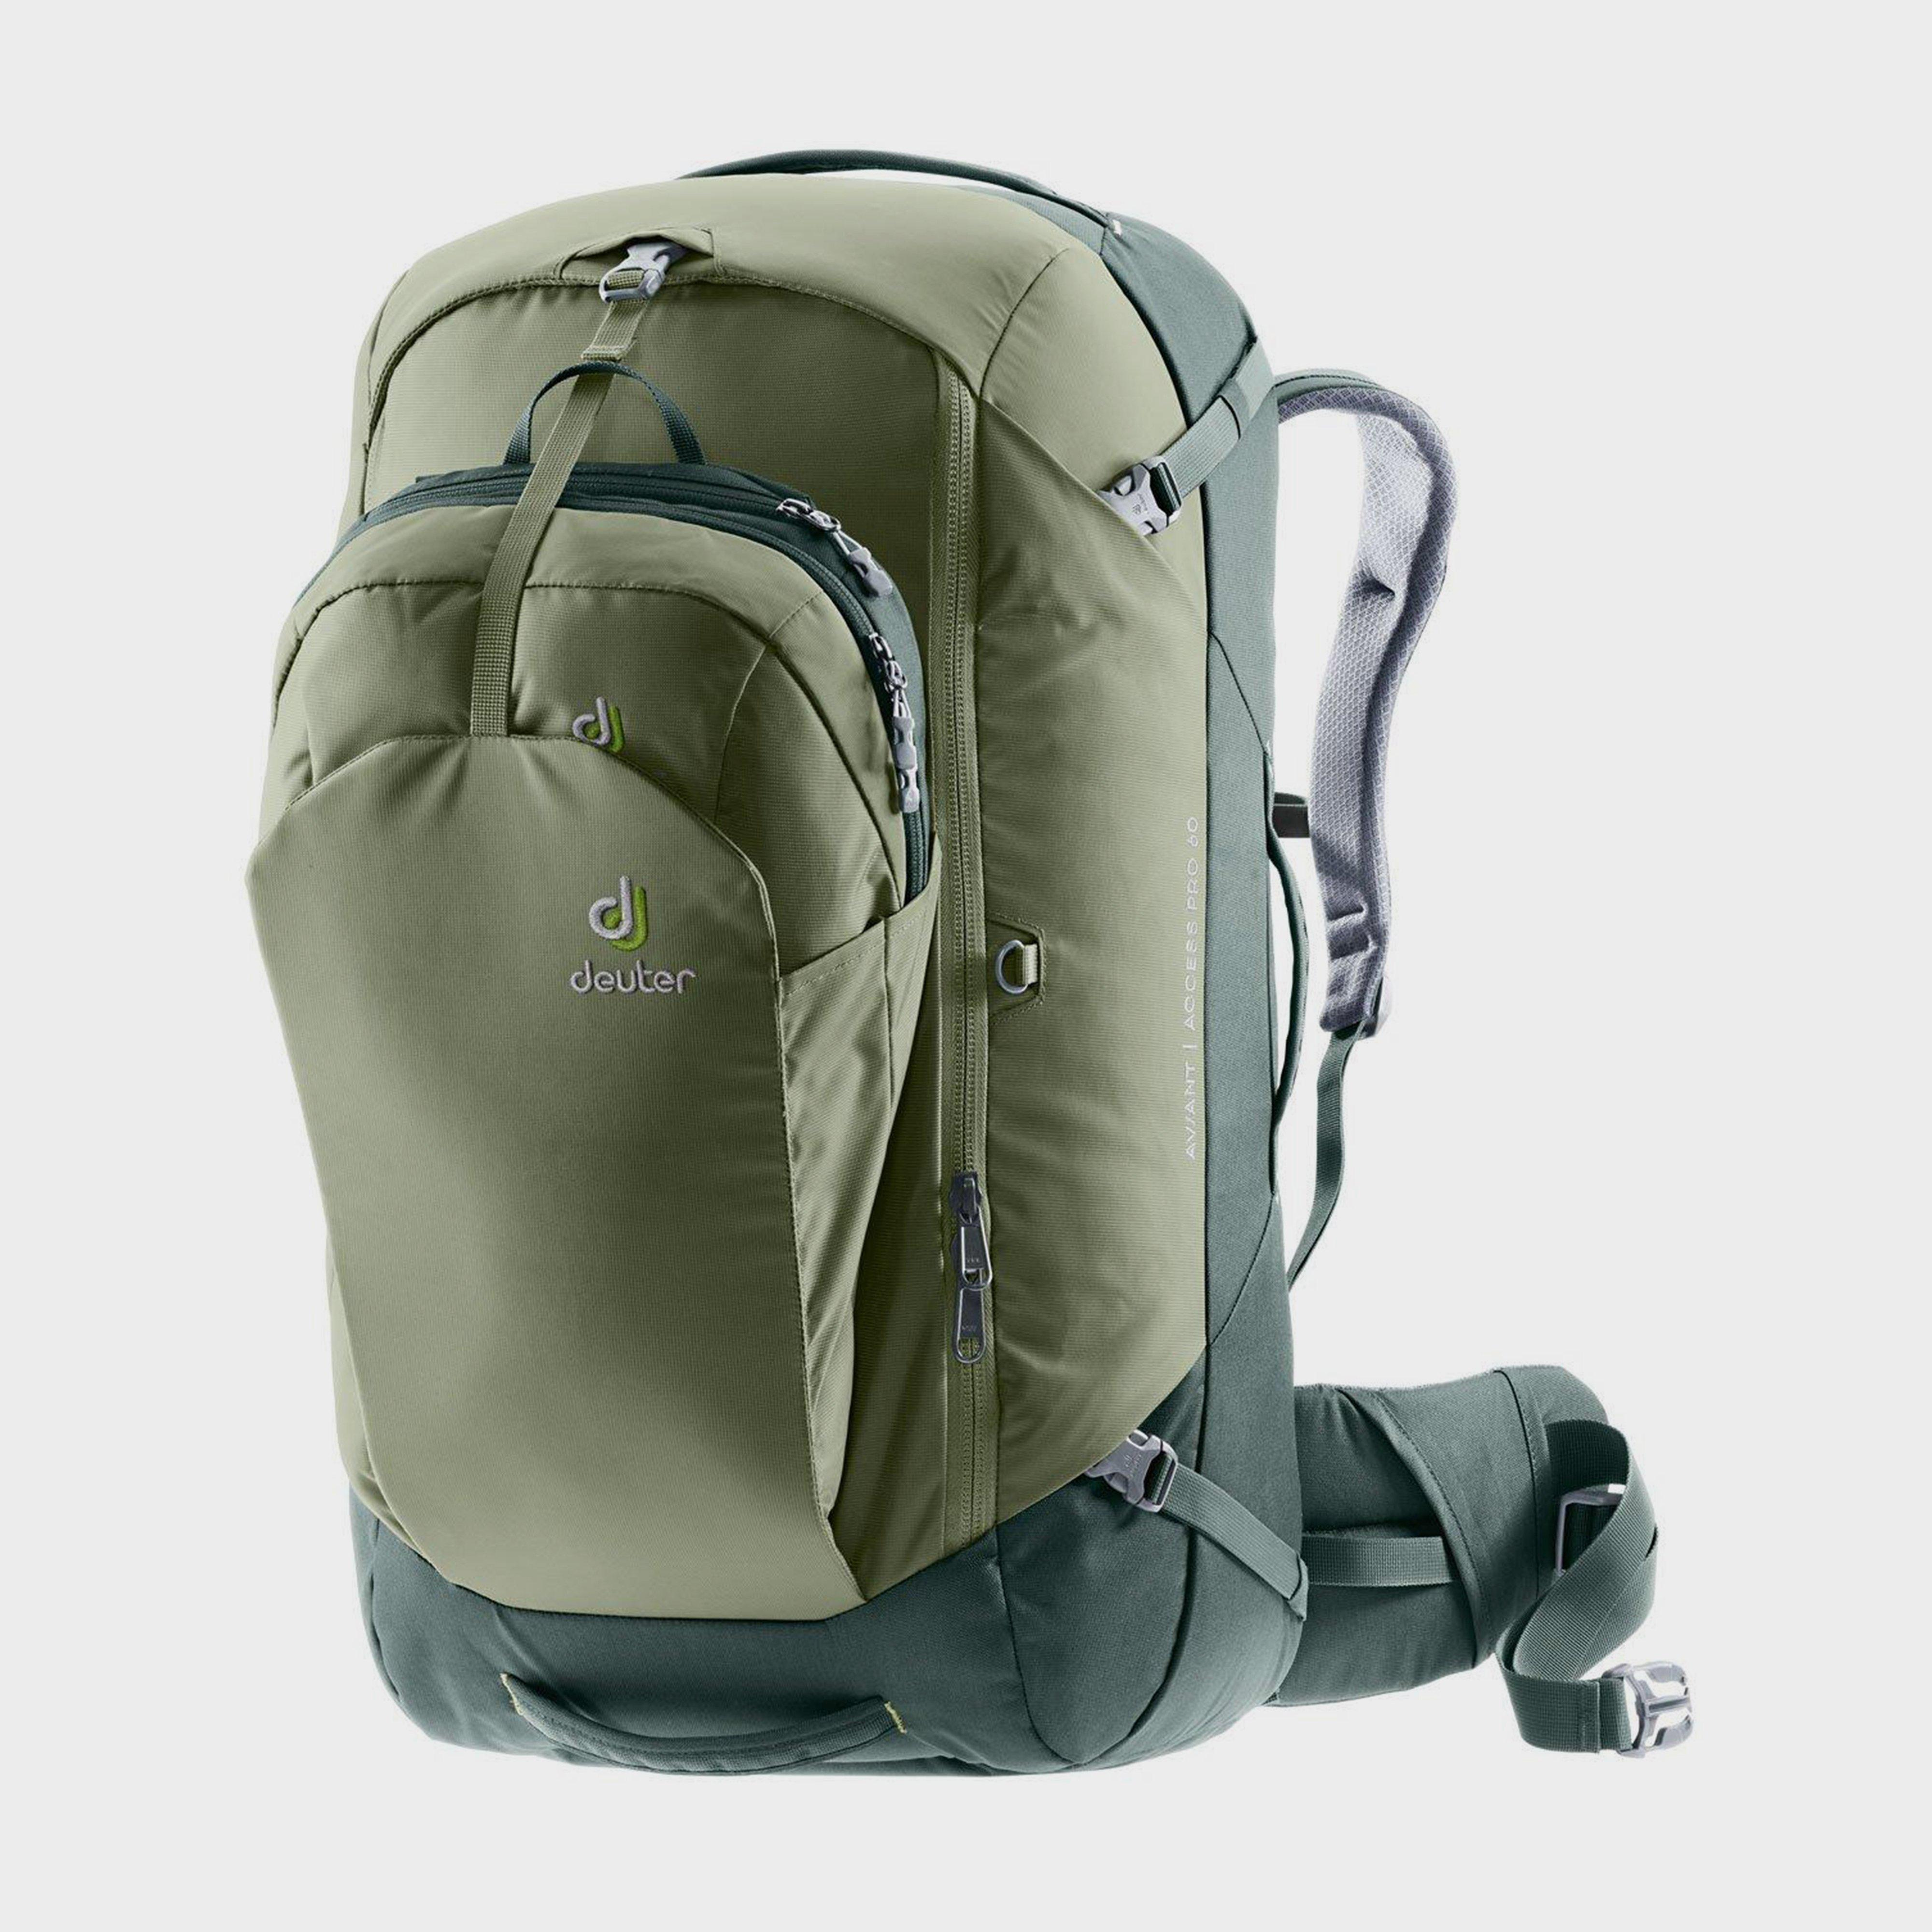 Deuter Aviant Pro 60 Travel Backpack - Green/Green, Green